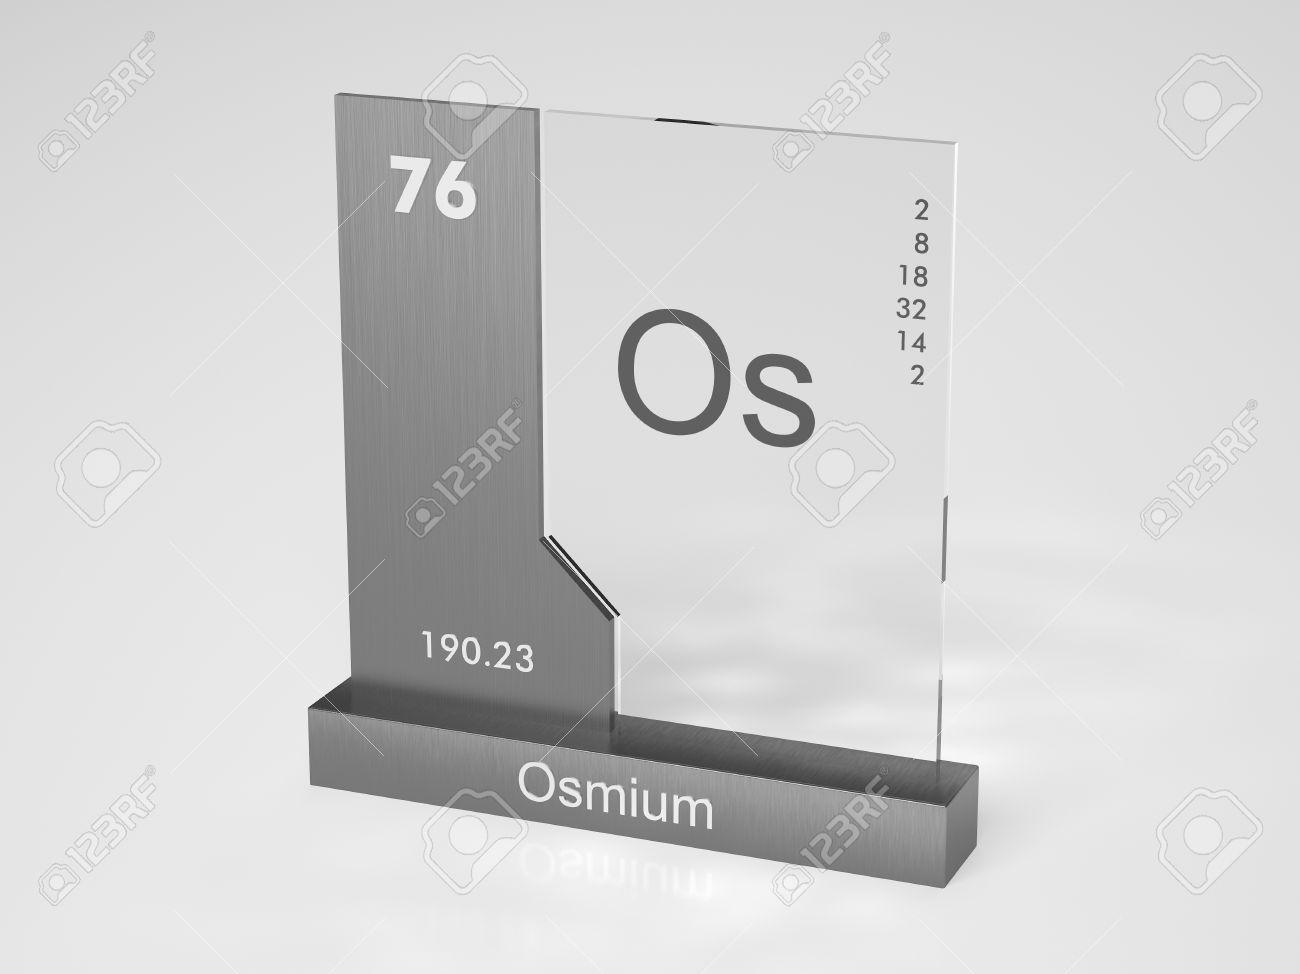 Osmium symbol os chemical element of the periodic table stock osmium symbol os chemical element of the periodic table stock photo 10569403 urtaz Choice Image